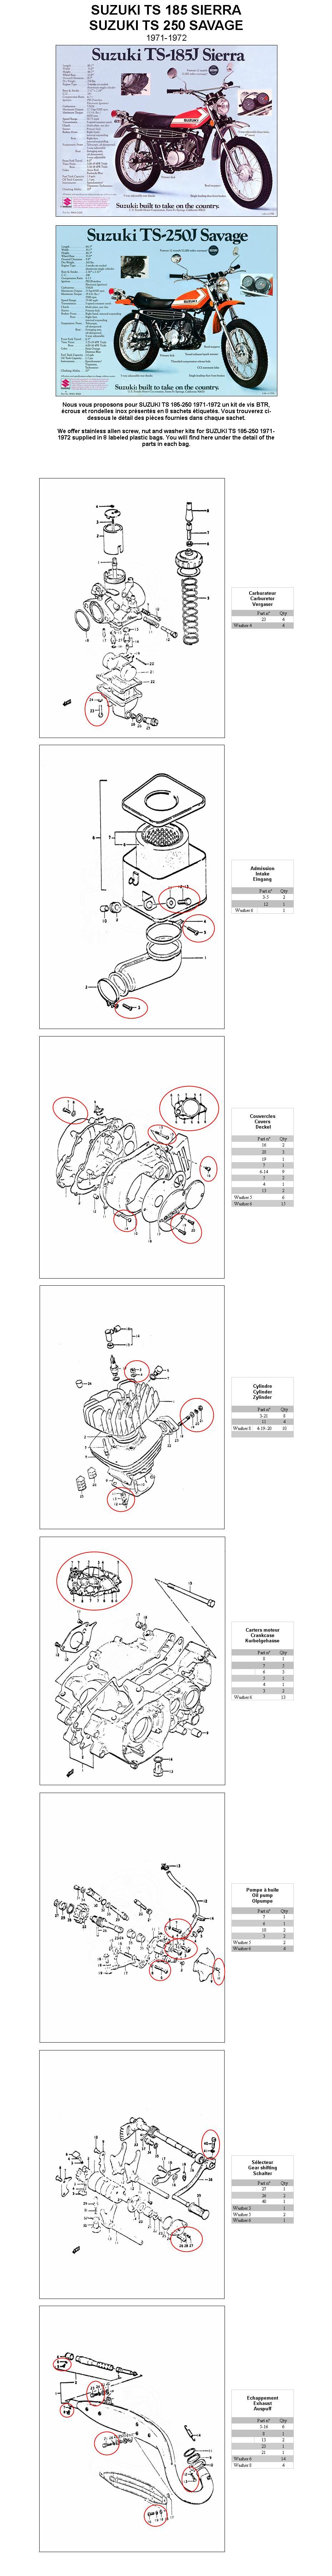 SUZUKI TS 250 185 1971-1972 carburetor & engine kit